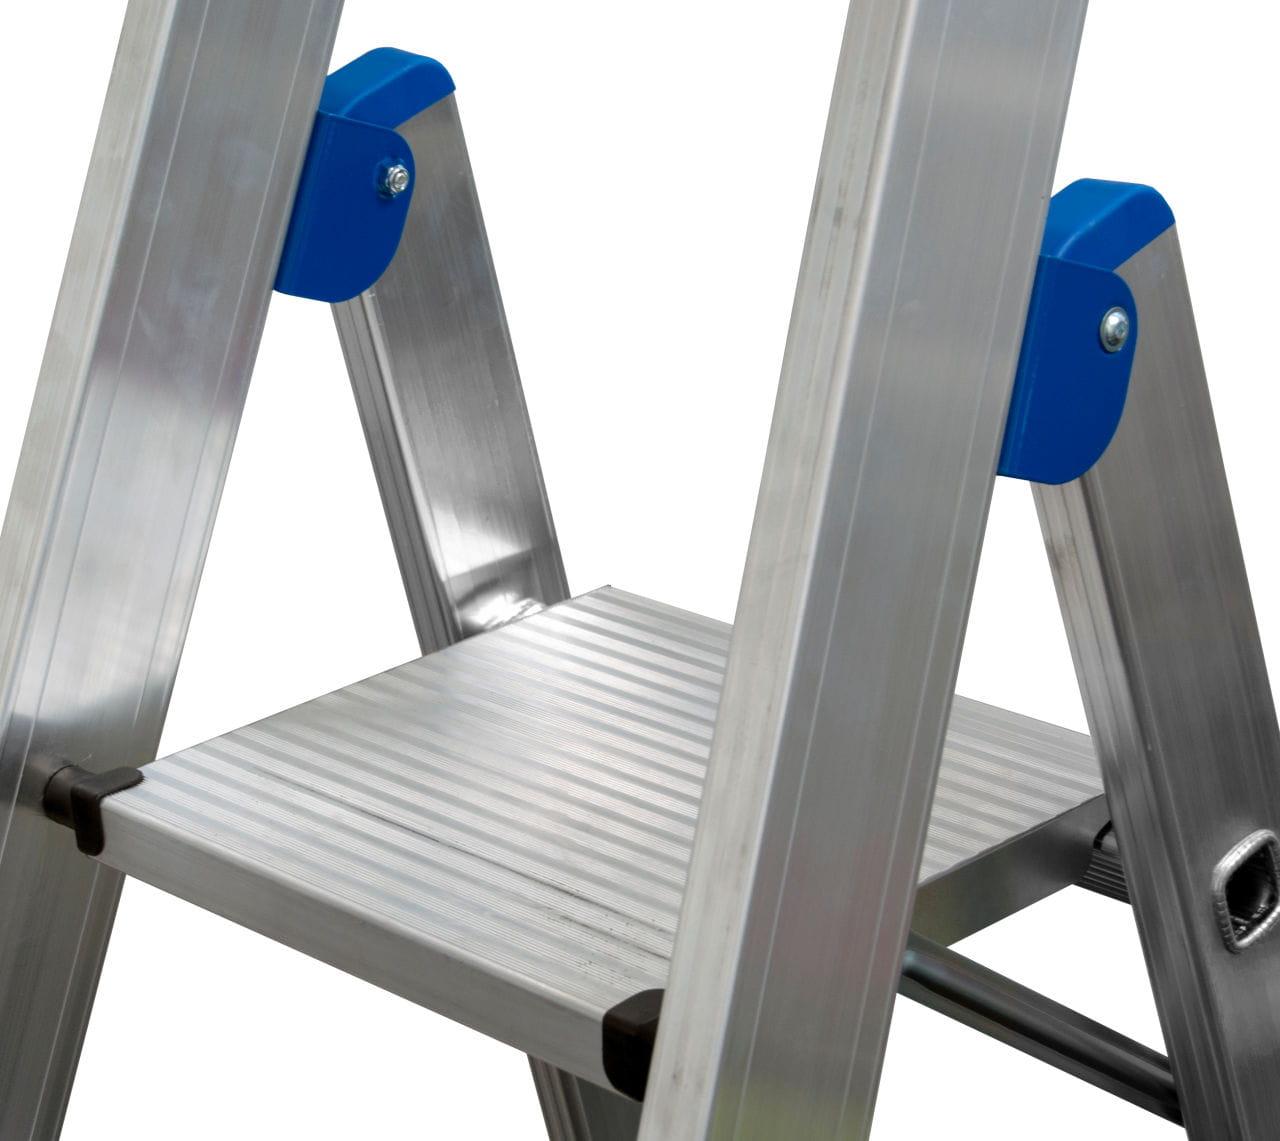 Drabina KRAUSE jezdniowa aluminiowa 1x7 stabilna platforma